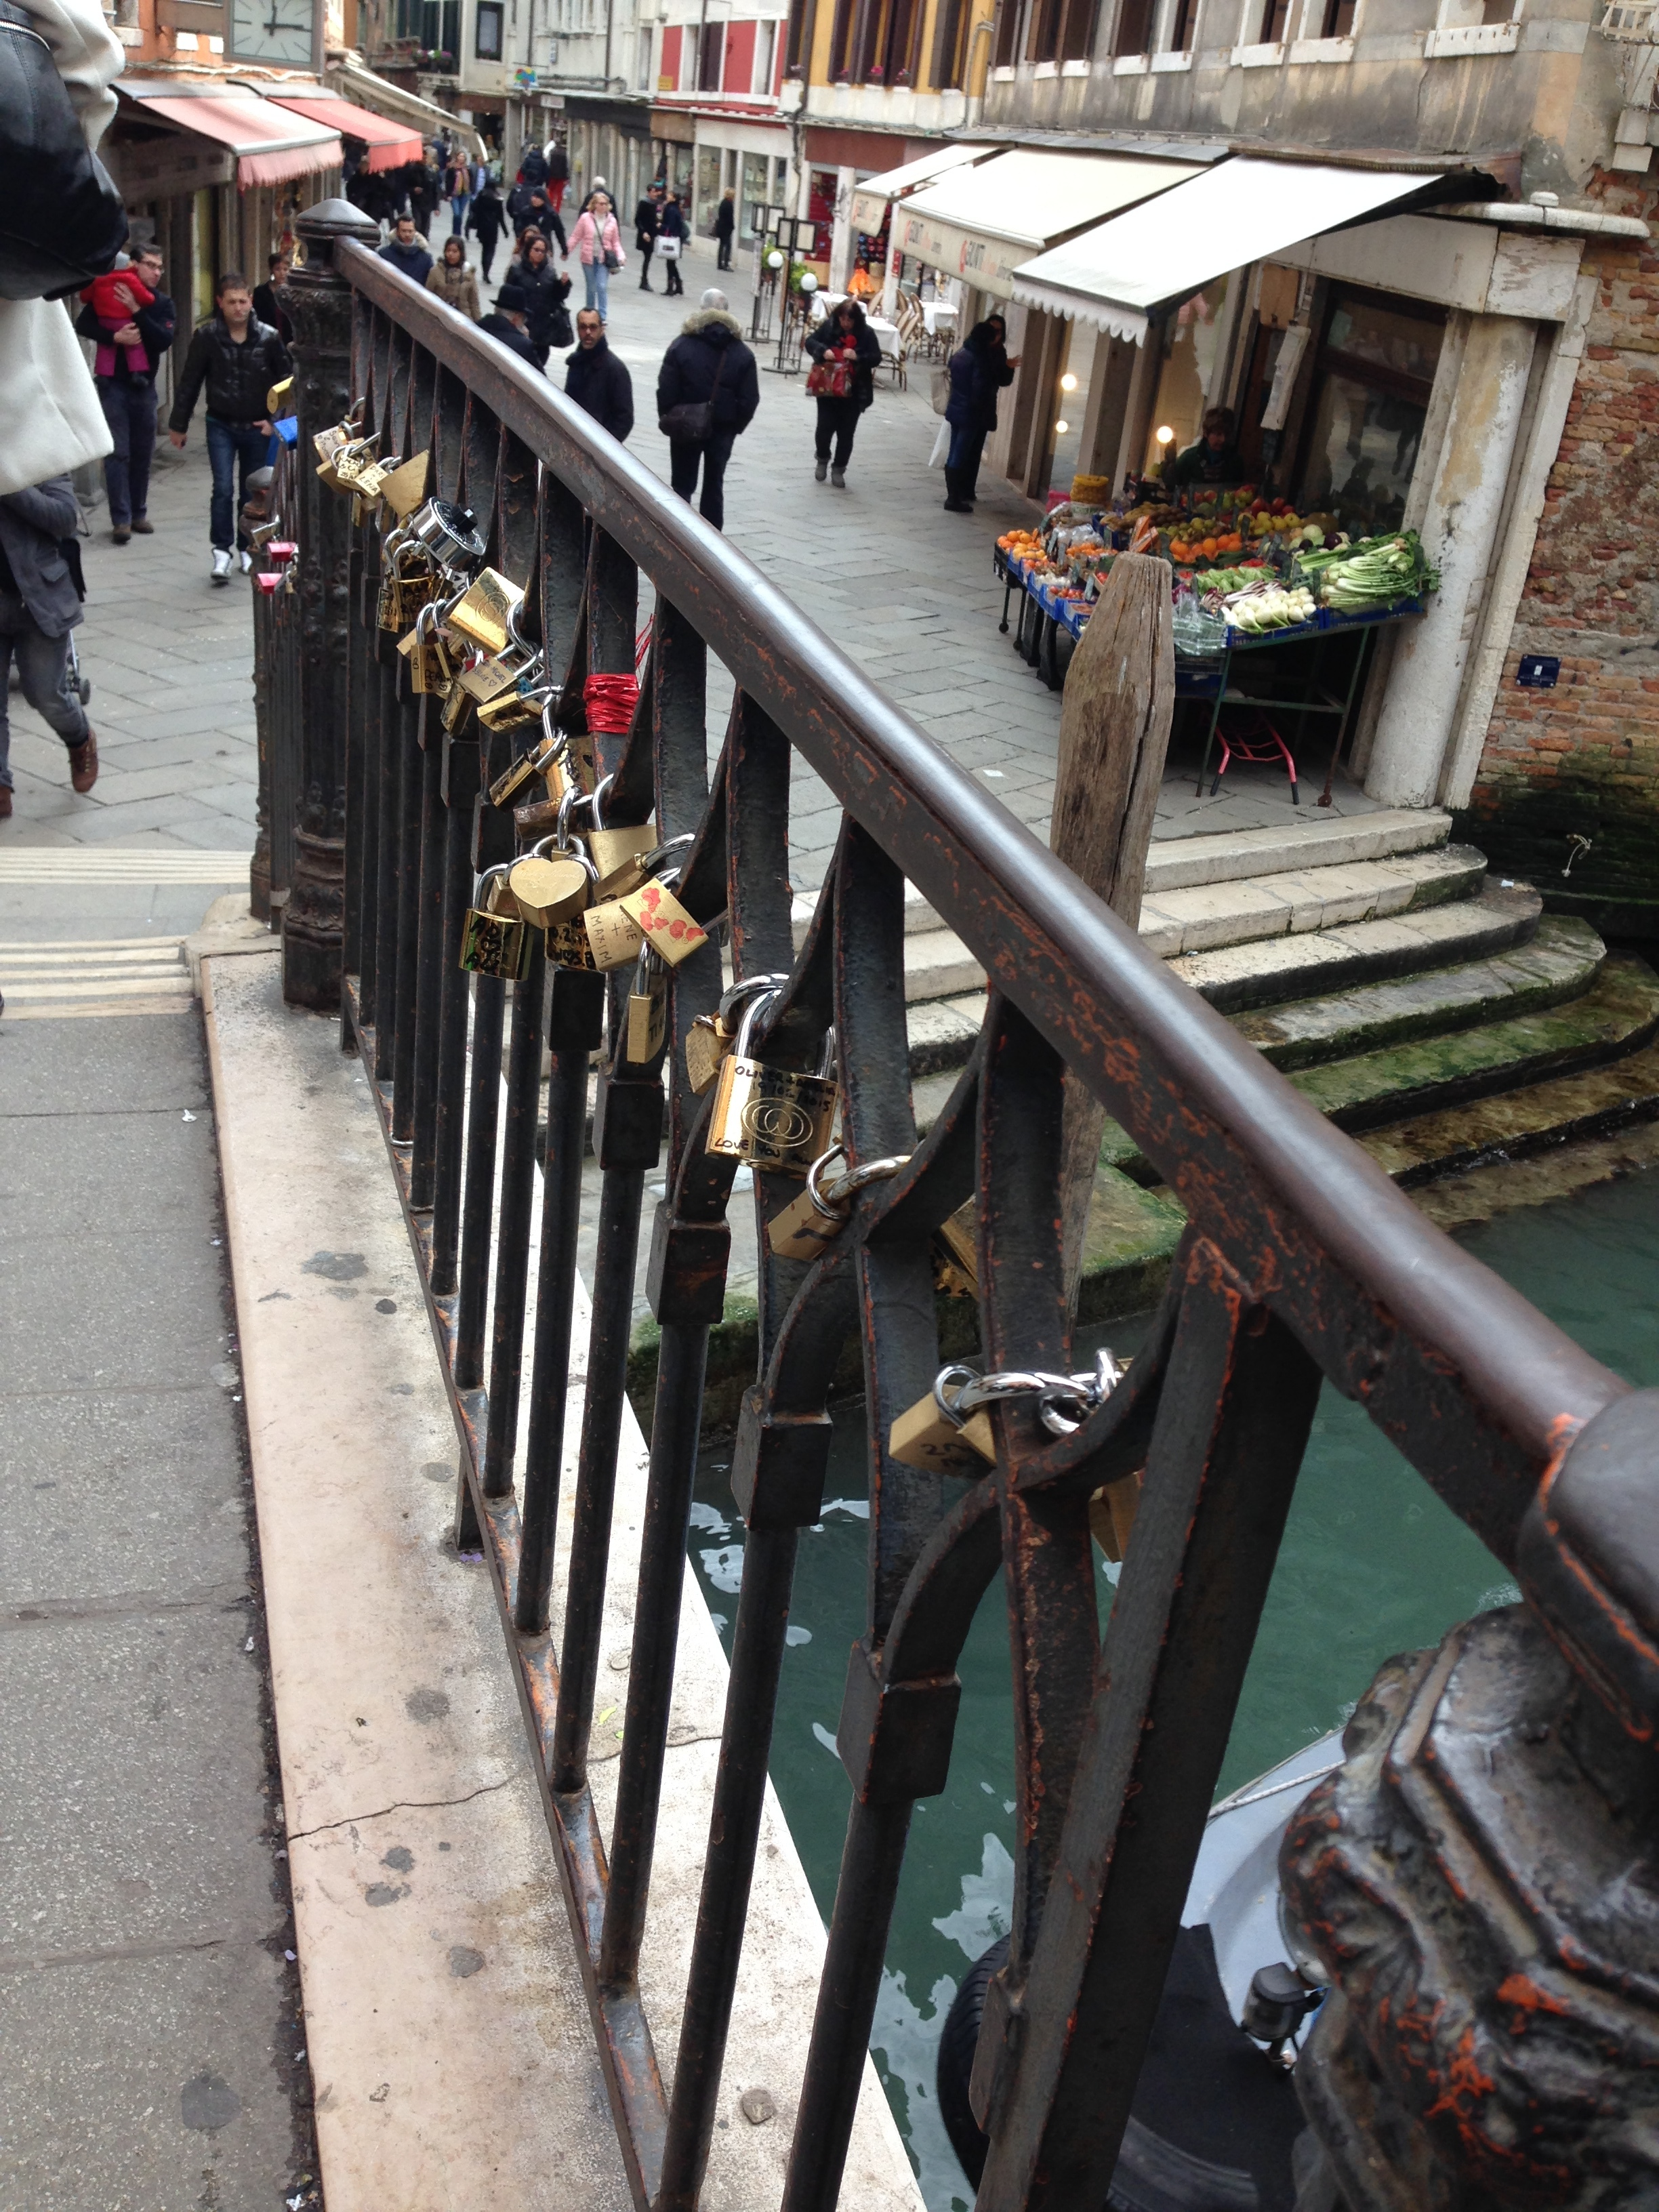 Venice's very own lock bridge!